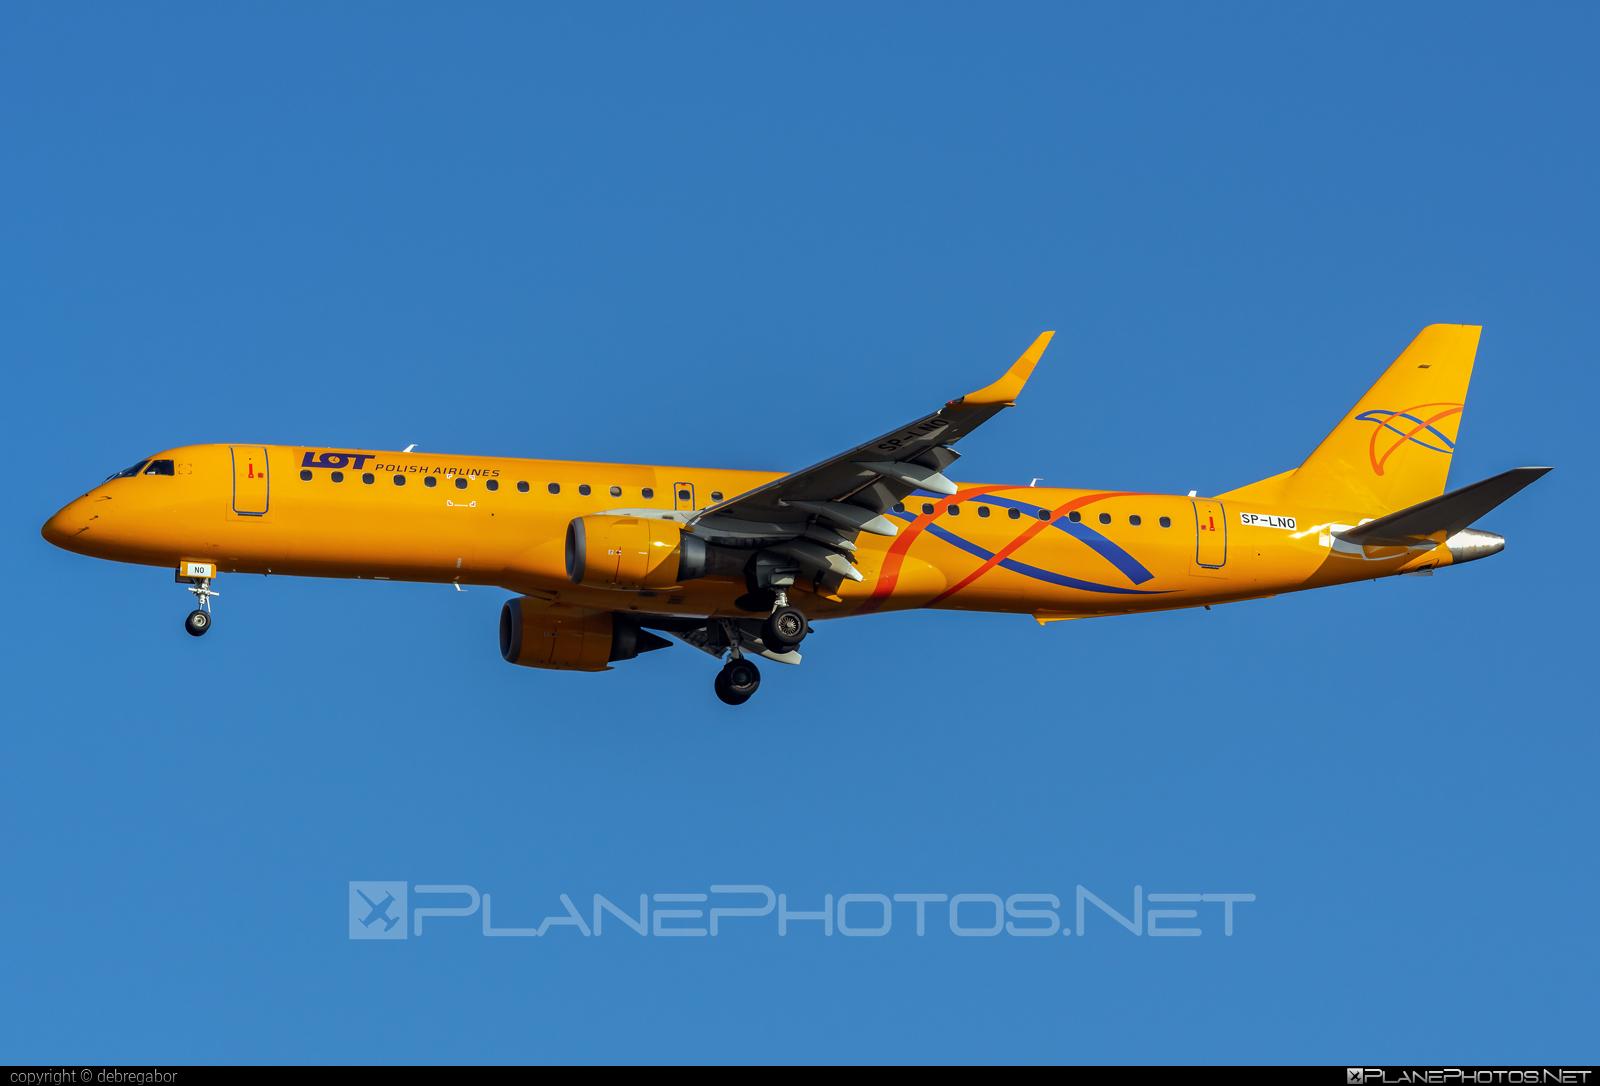 Embraer E195LR (ERJ-190-200LR) - SP-LNO operated by LOT Polish Airlines #e190 #e190200 #e190200lr #e195lr #embraer #embraer190200lr #embraer195 #embraer195lr #lot #lotpolishairlines